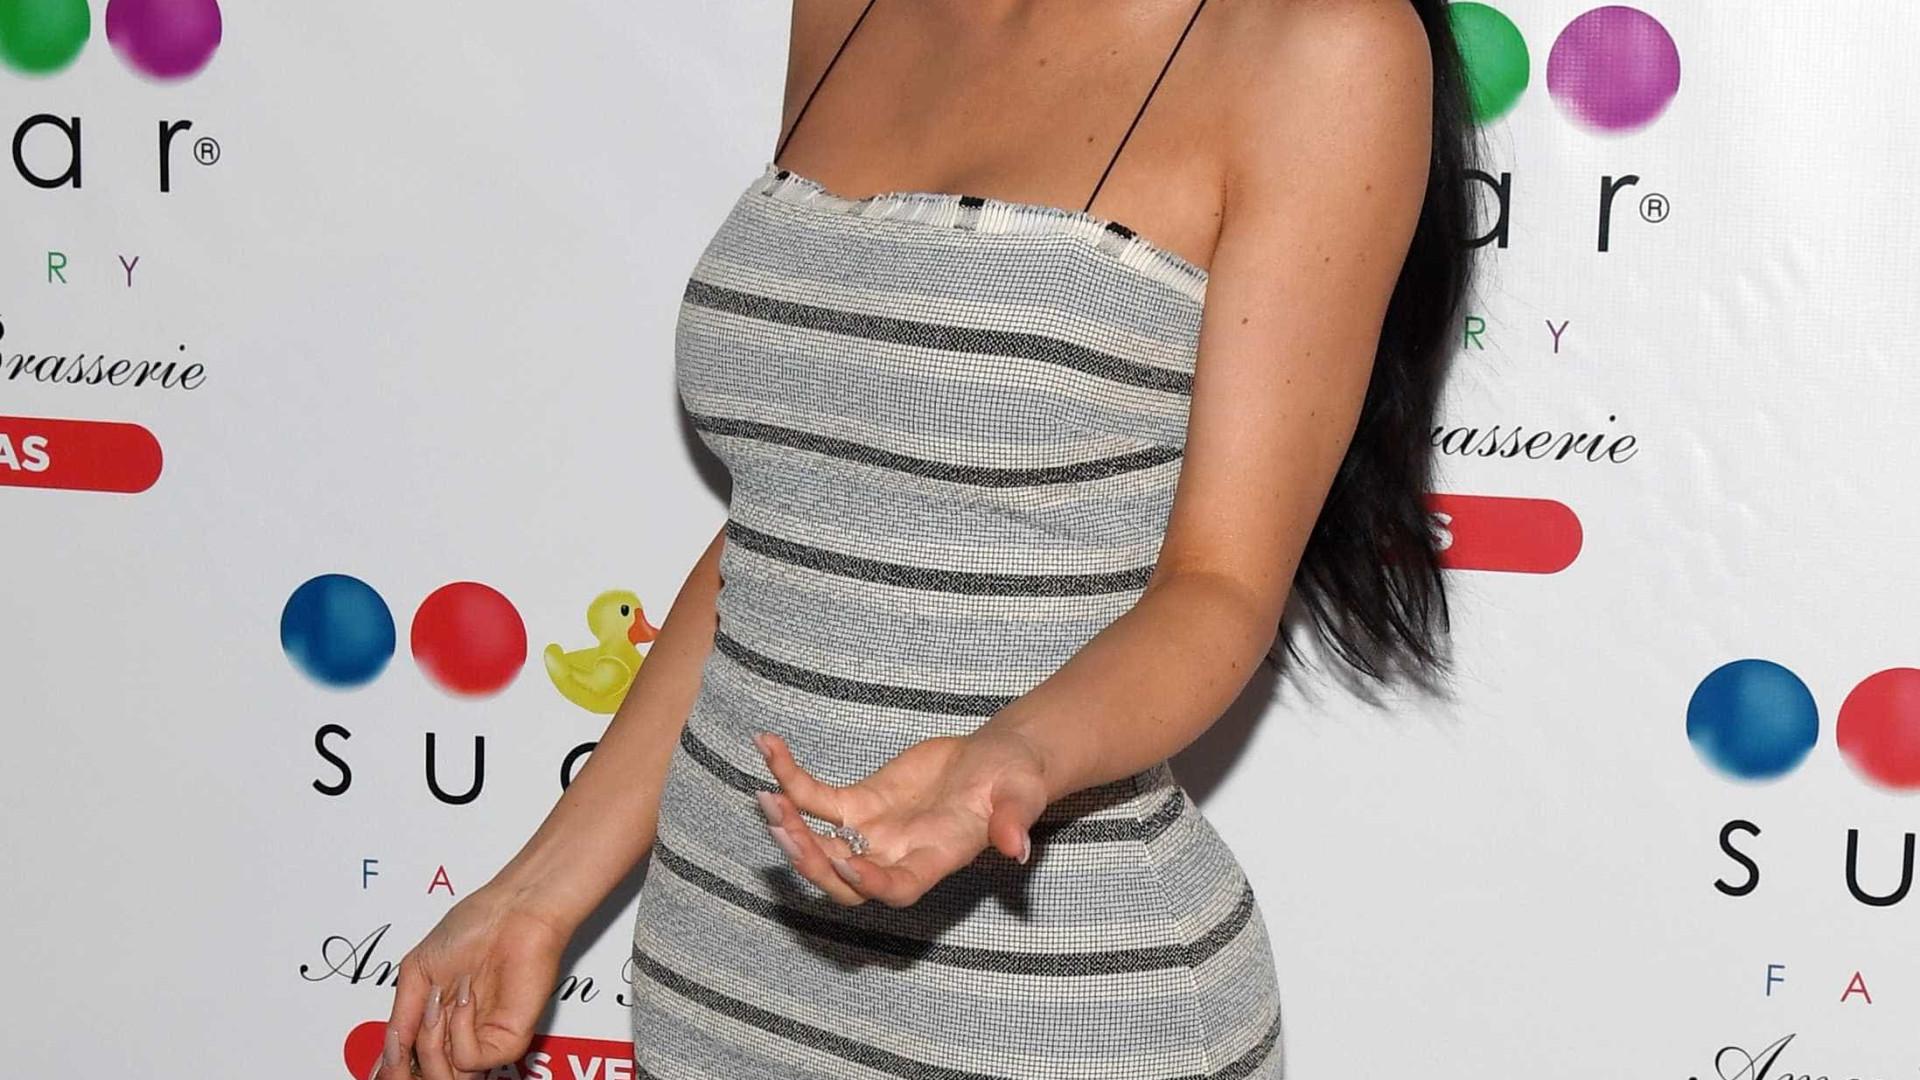 Kylie Jenner: Fotografia levanta fortes suspeitas de gravidez